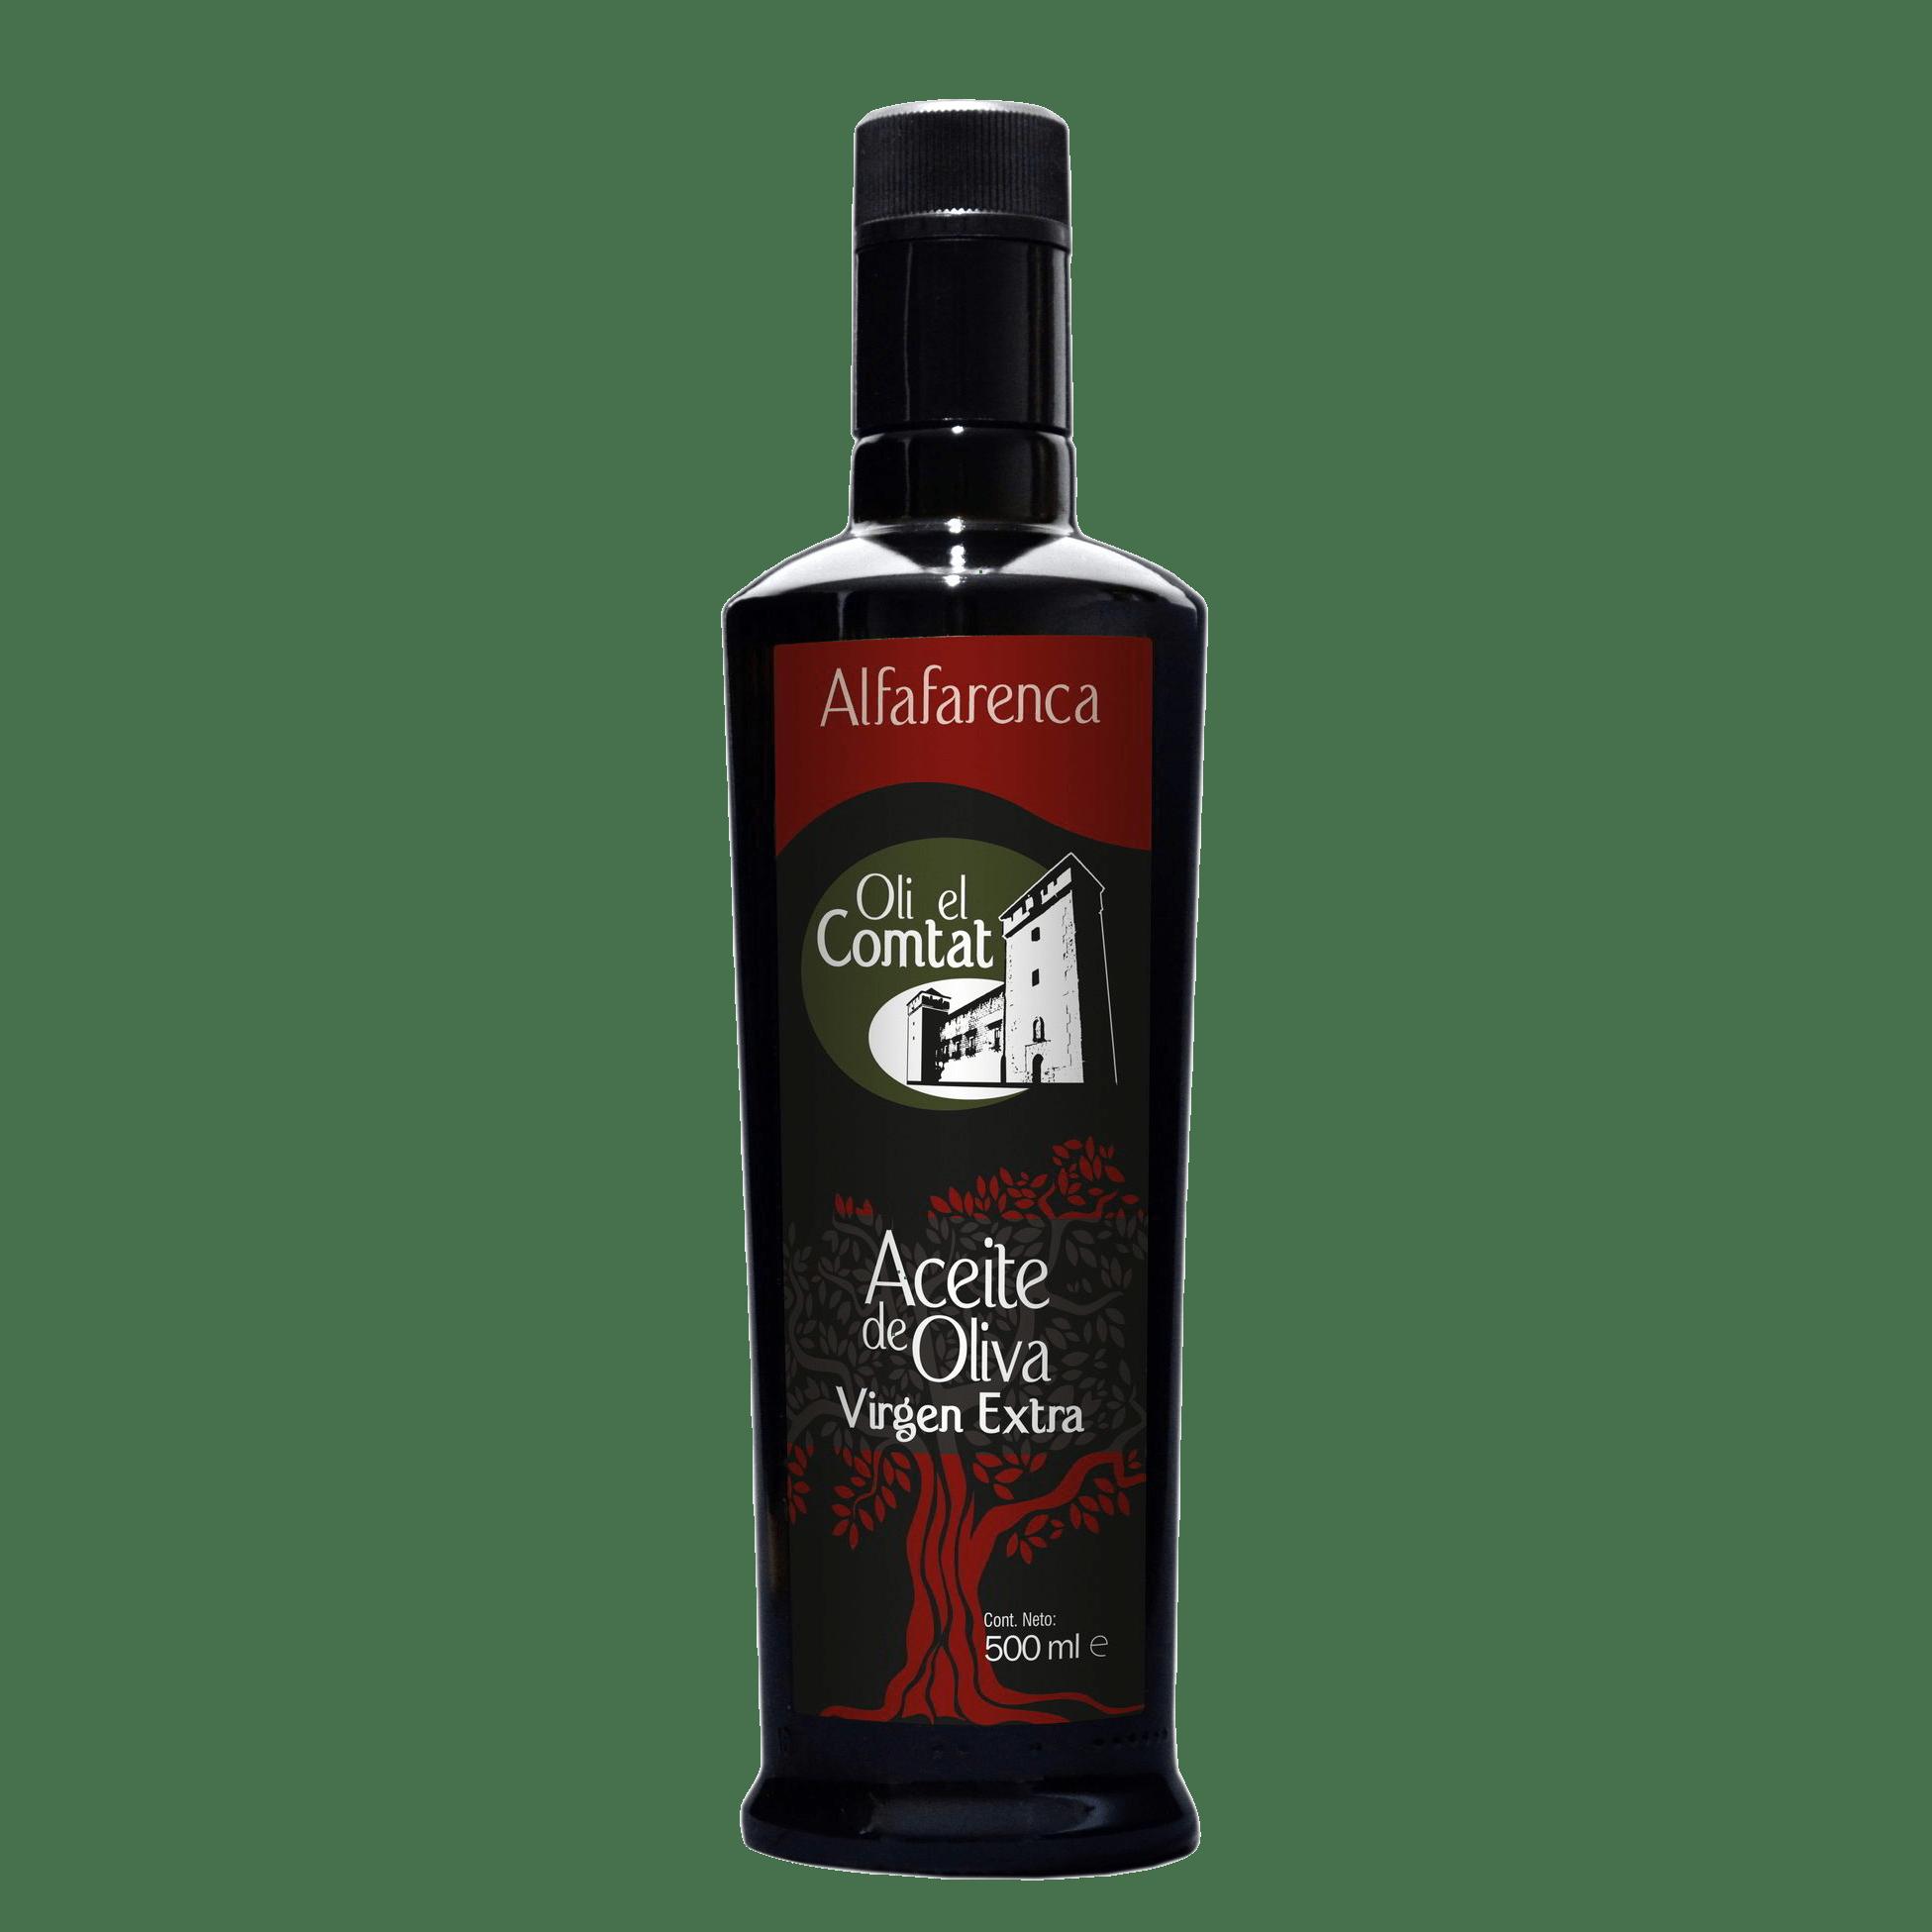 Aceite_ de_oliva_virgen_extra_alfafarenca_500ml